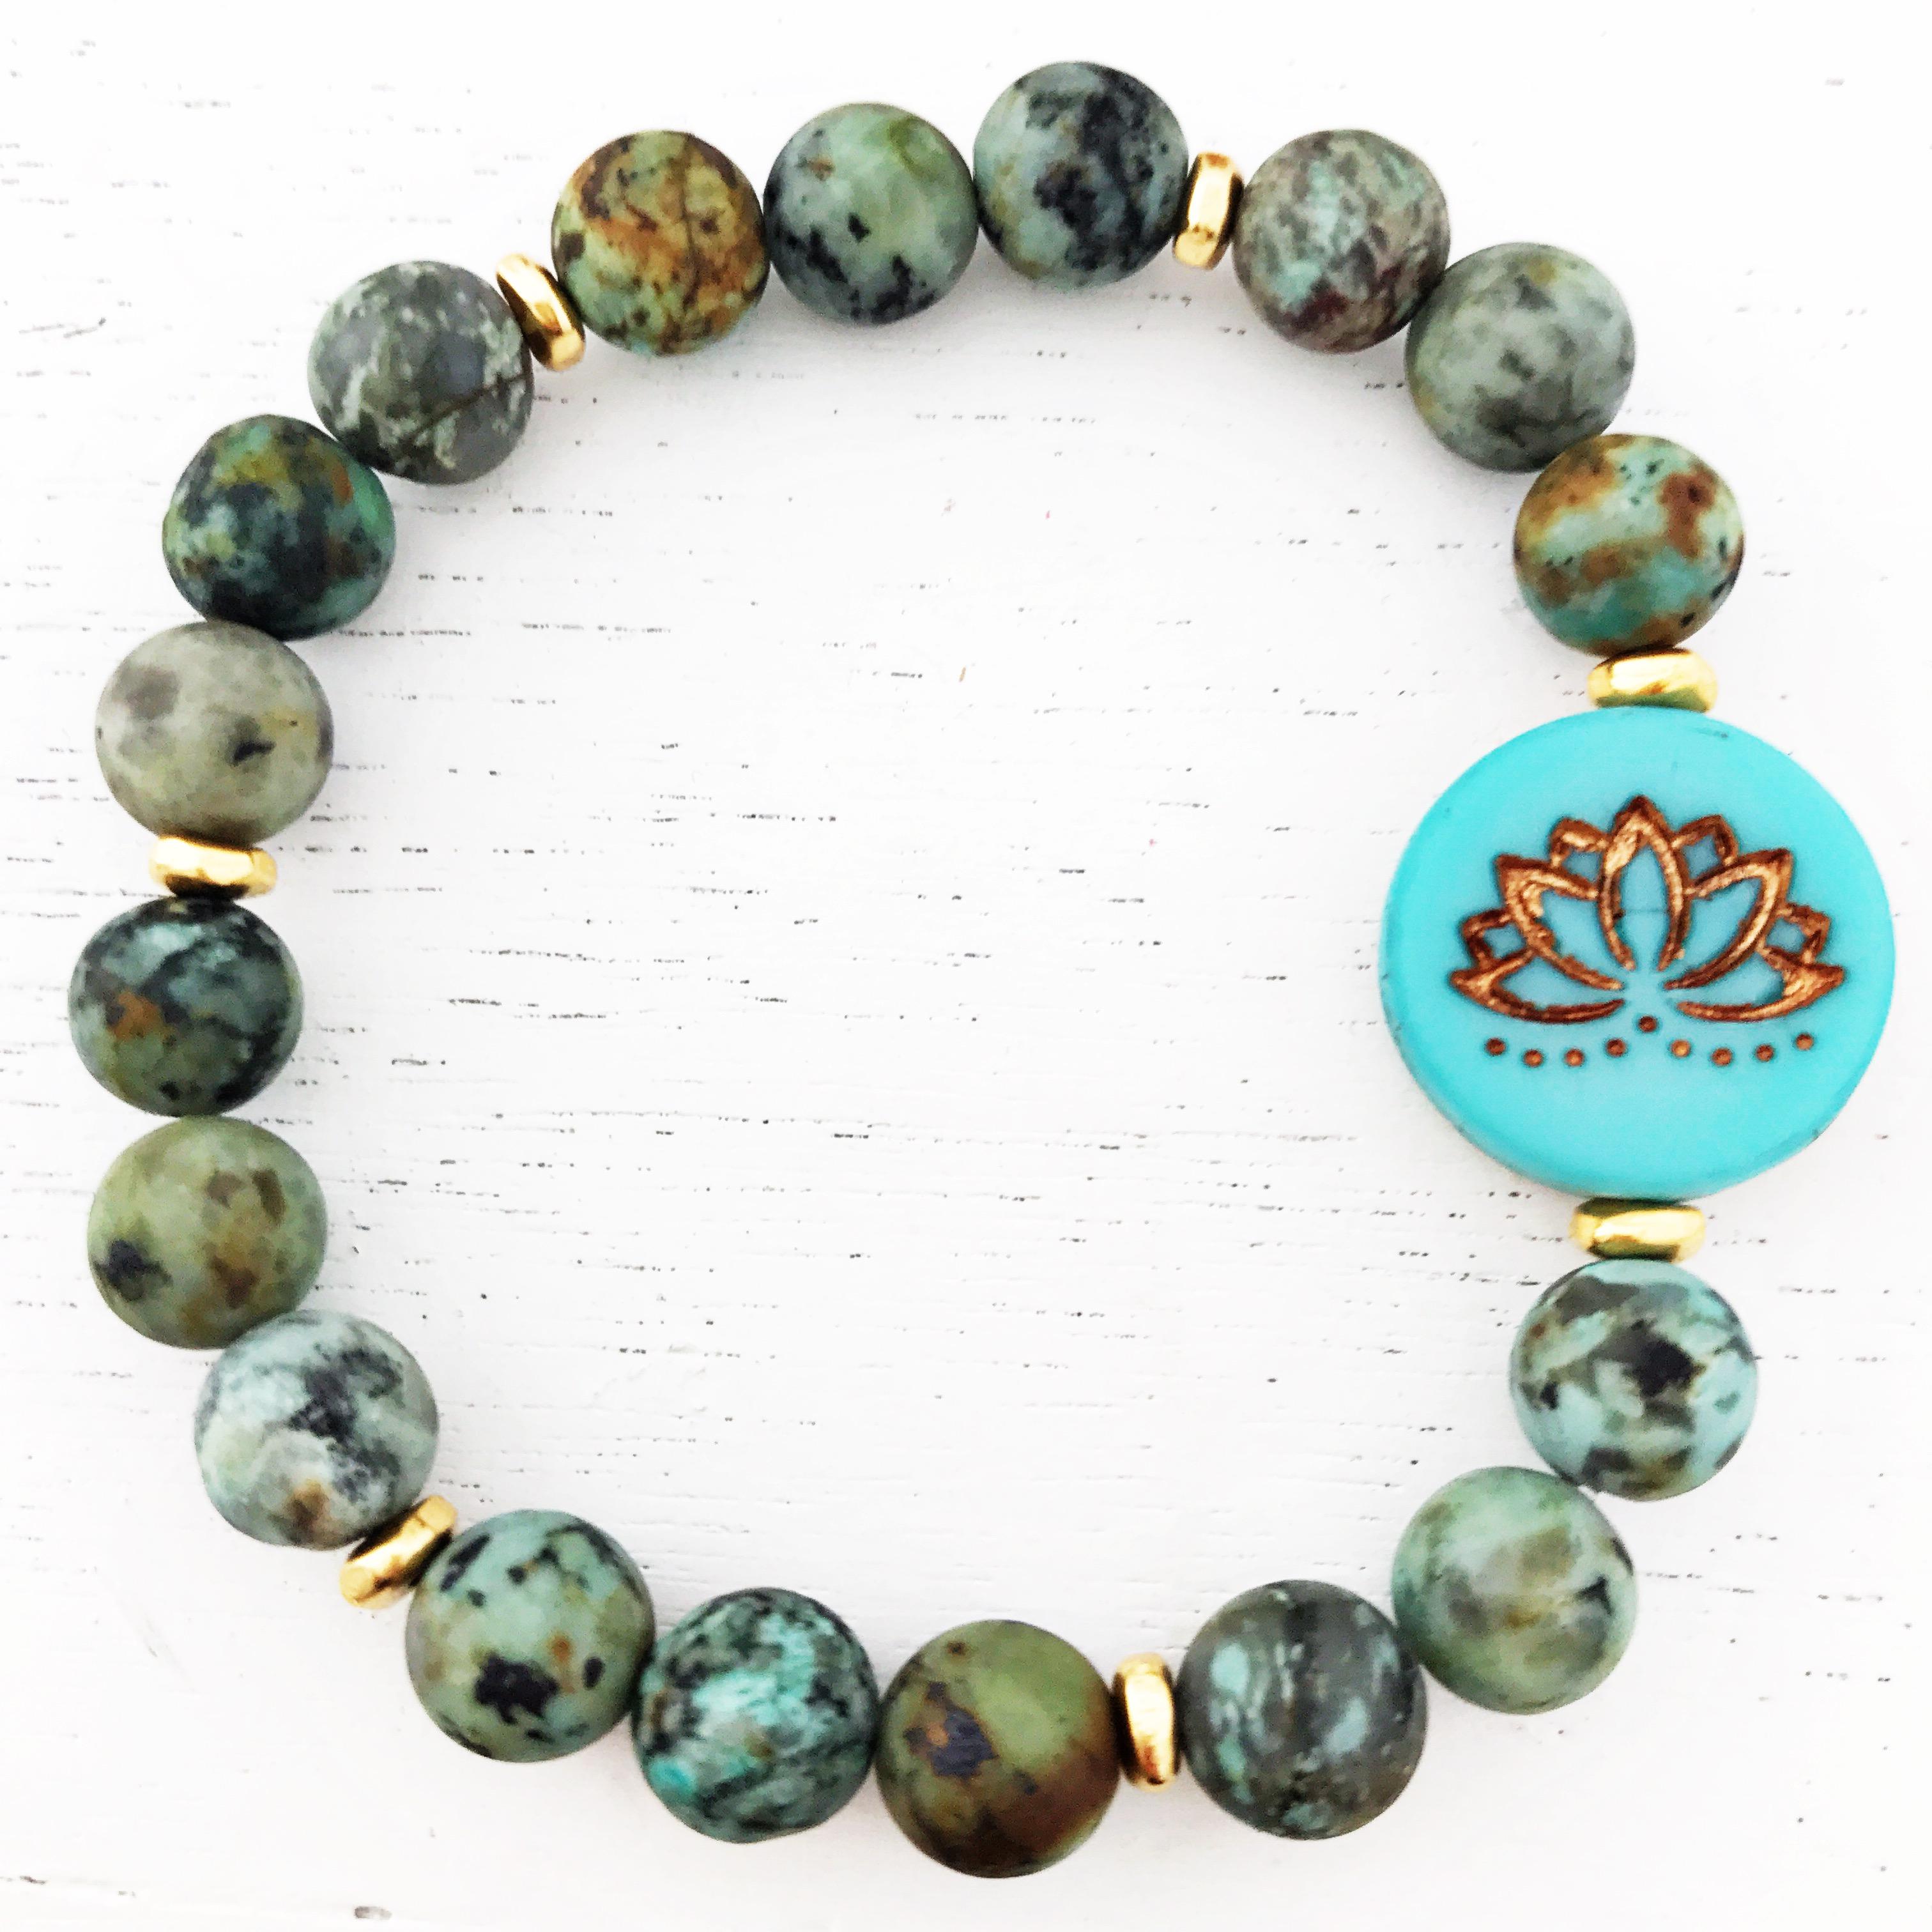 African Turquoise Jasper Matte Gemstones Lotus Flower Healing